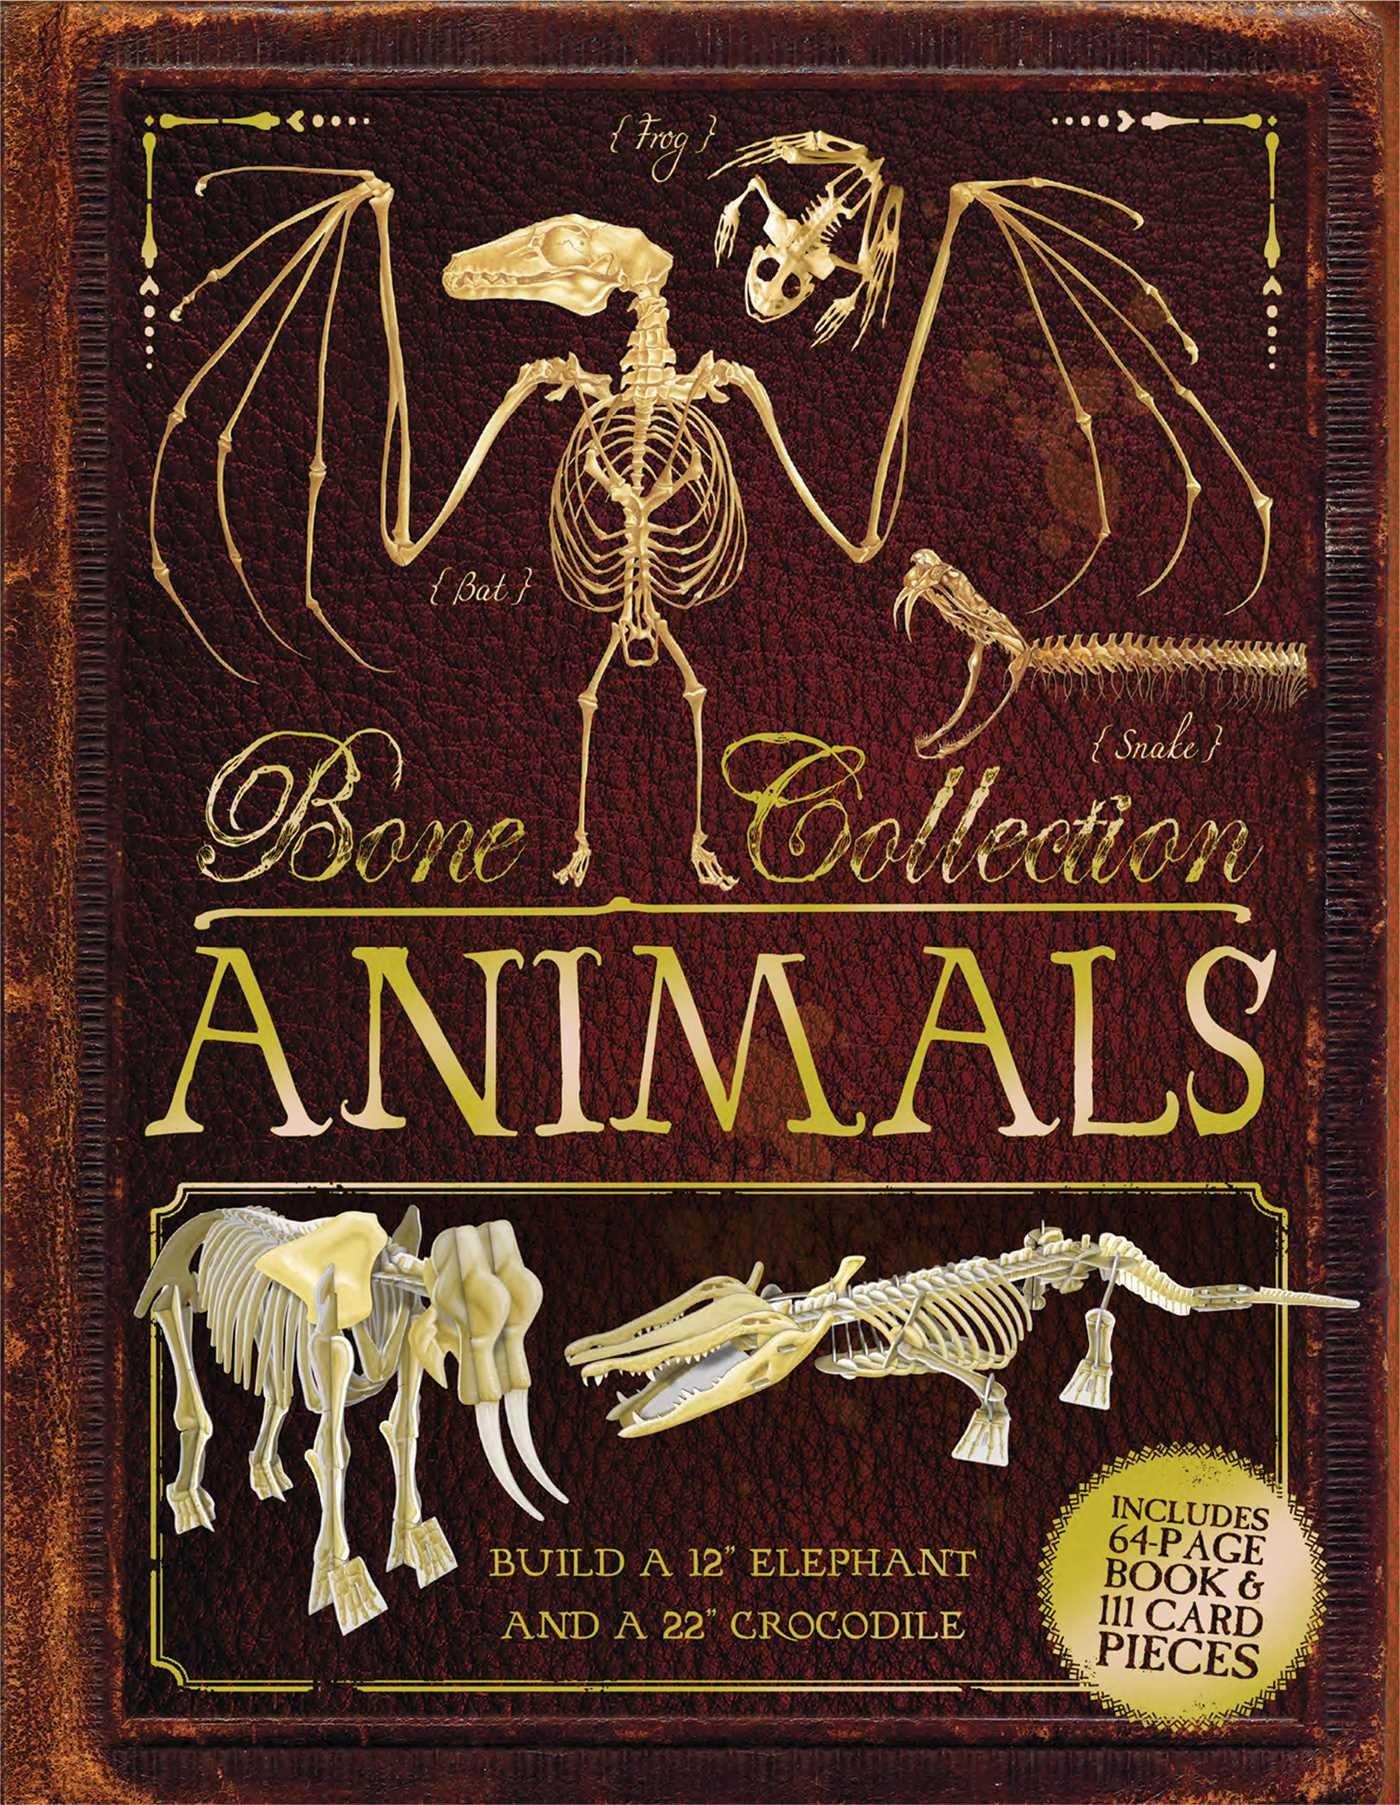 Bone Collection Animals Rob Colson Sandra Doyle Elizabeth Gray Squirrel Skeleton Diagram The Of A Greyhound Steve Kirk 9781684122493 Books